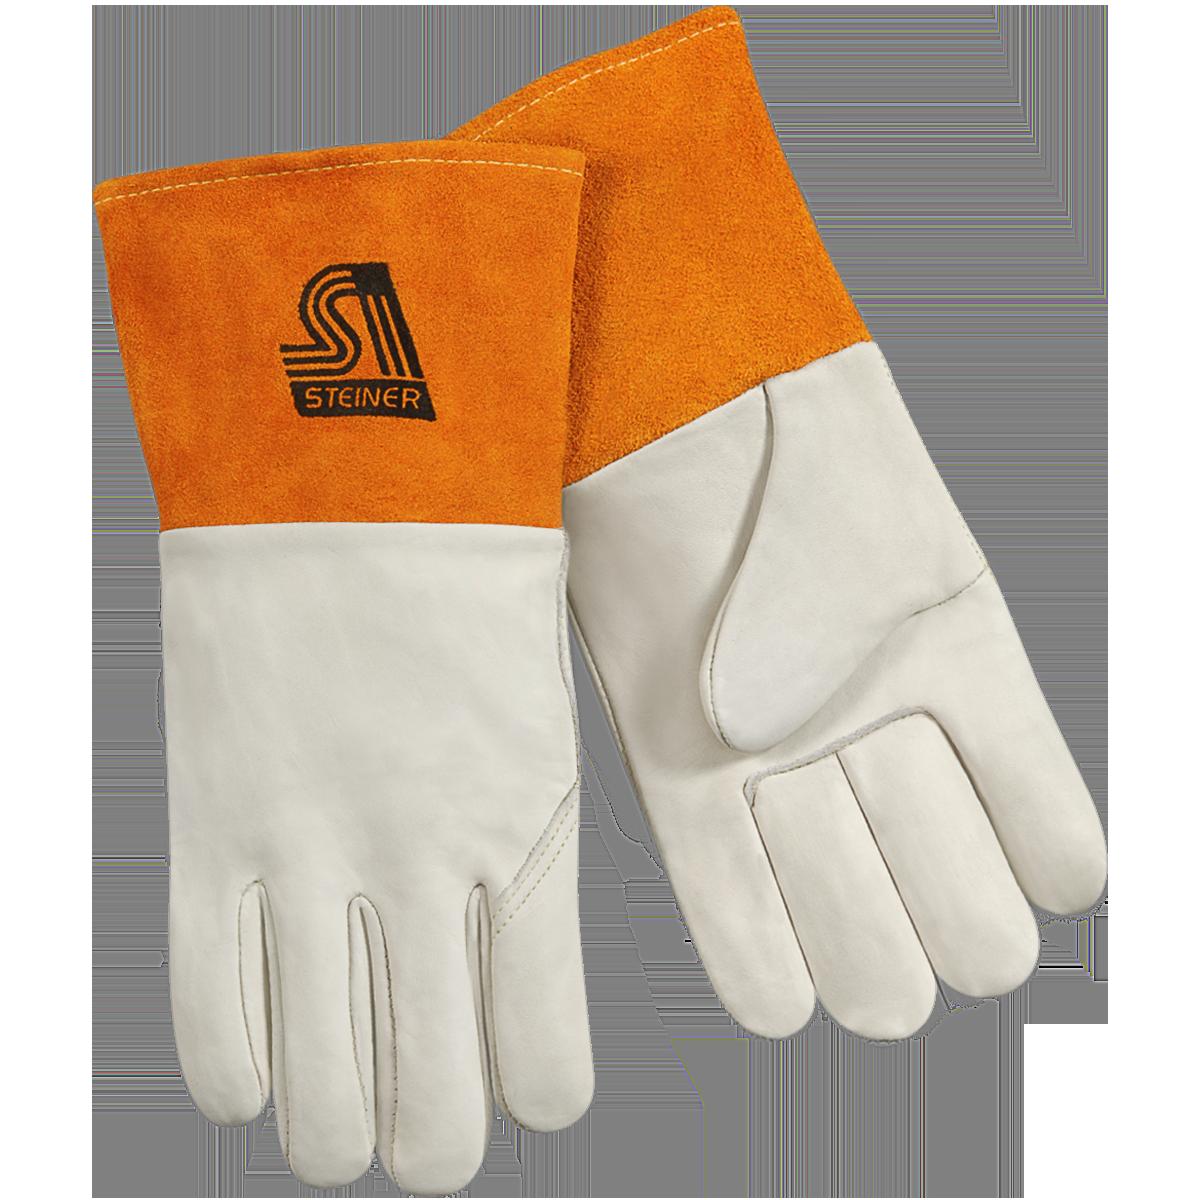 Steiner 0217-2X Grain Cowhide MIG/TIG Gloves, 2X-Large